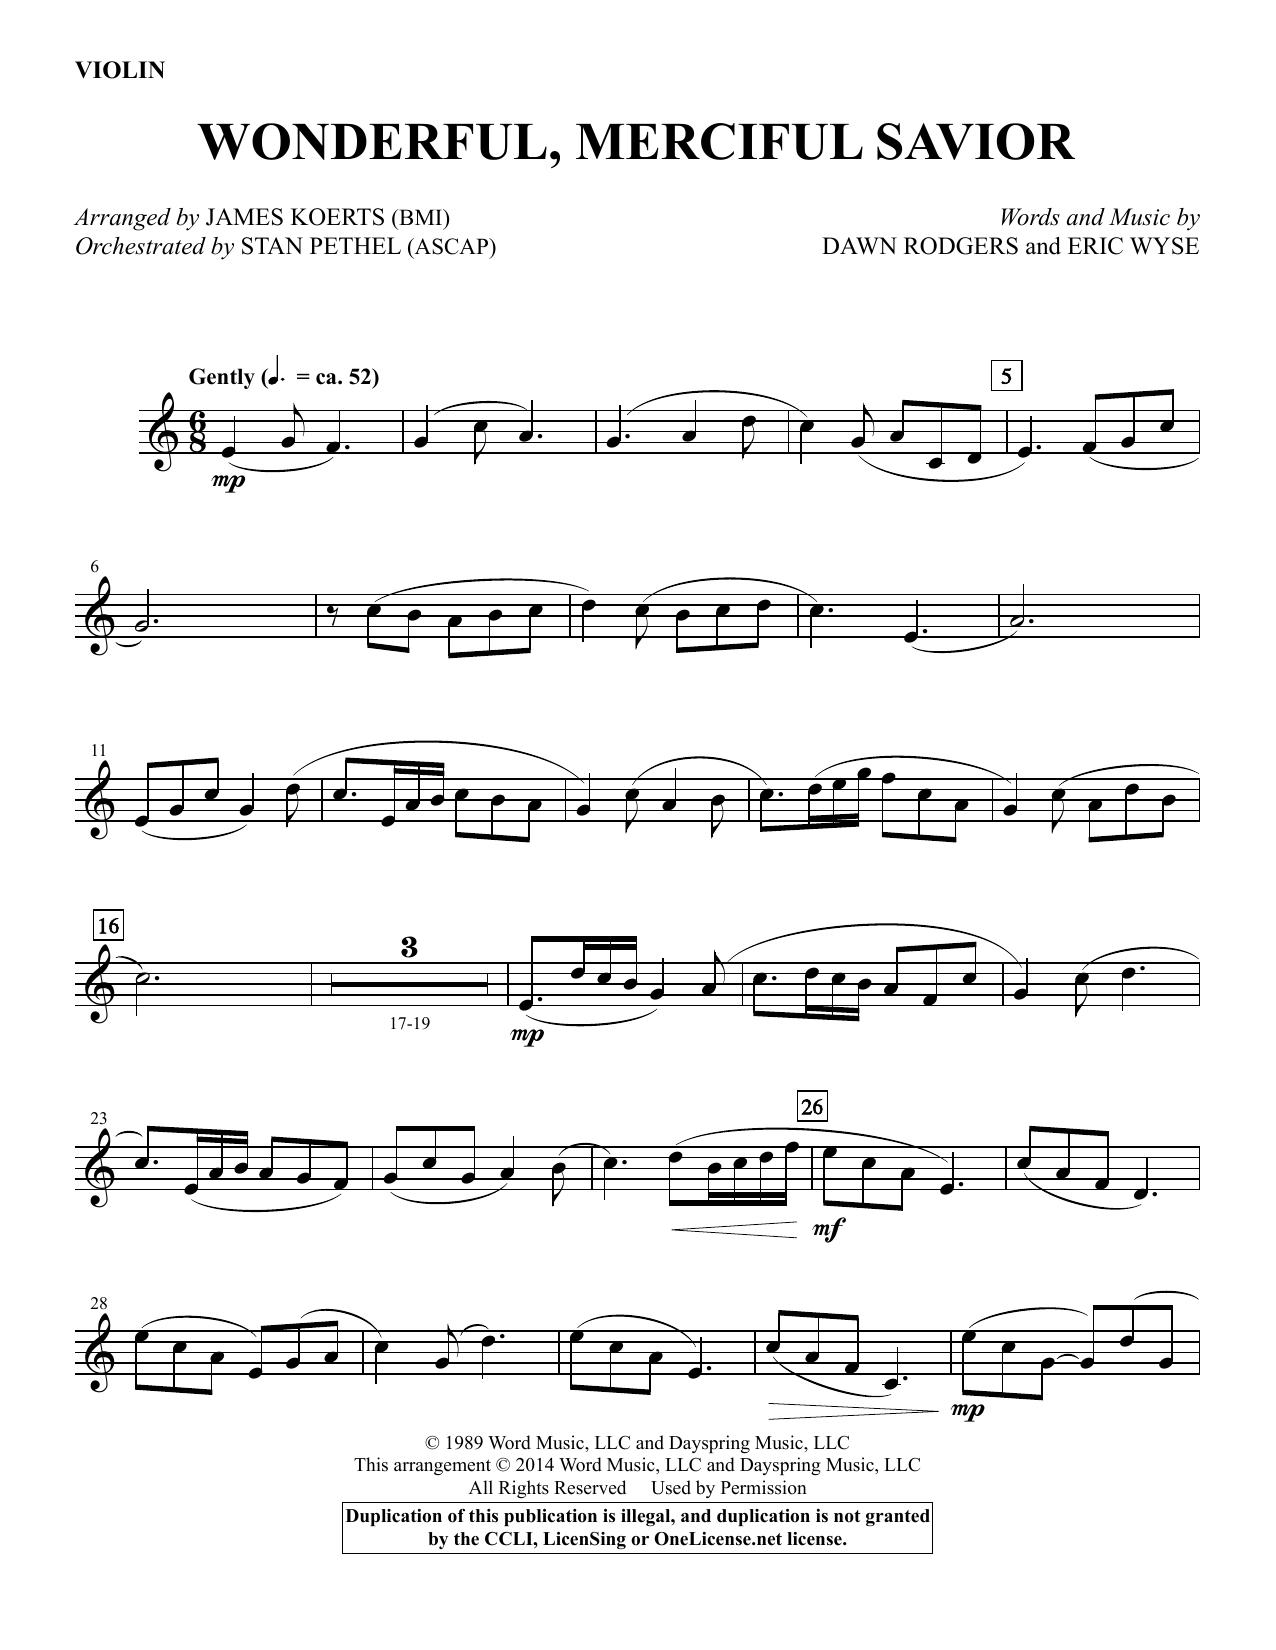 James Koerts Wonderful, Merciful Savior - Violin sheet music notes and chords. Download Printable PDF.